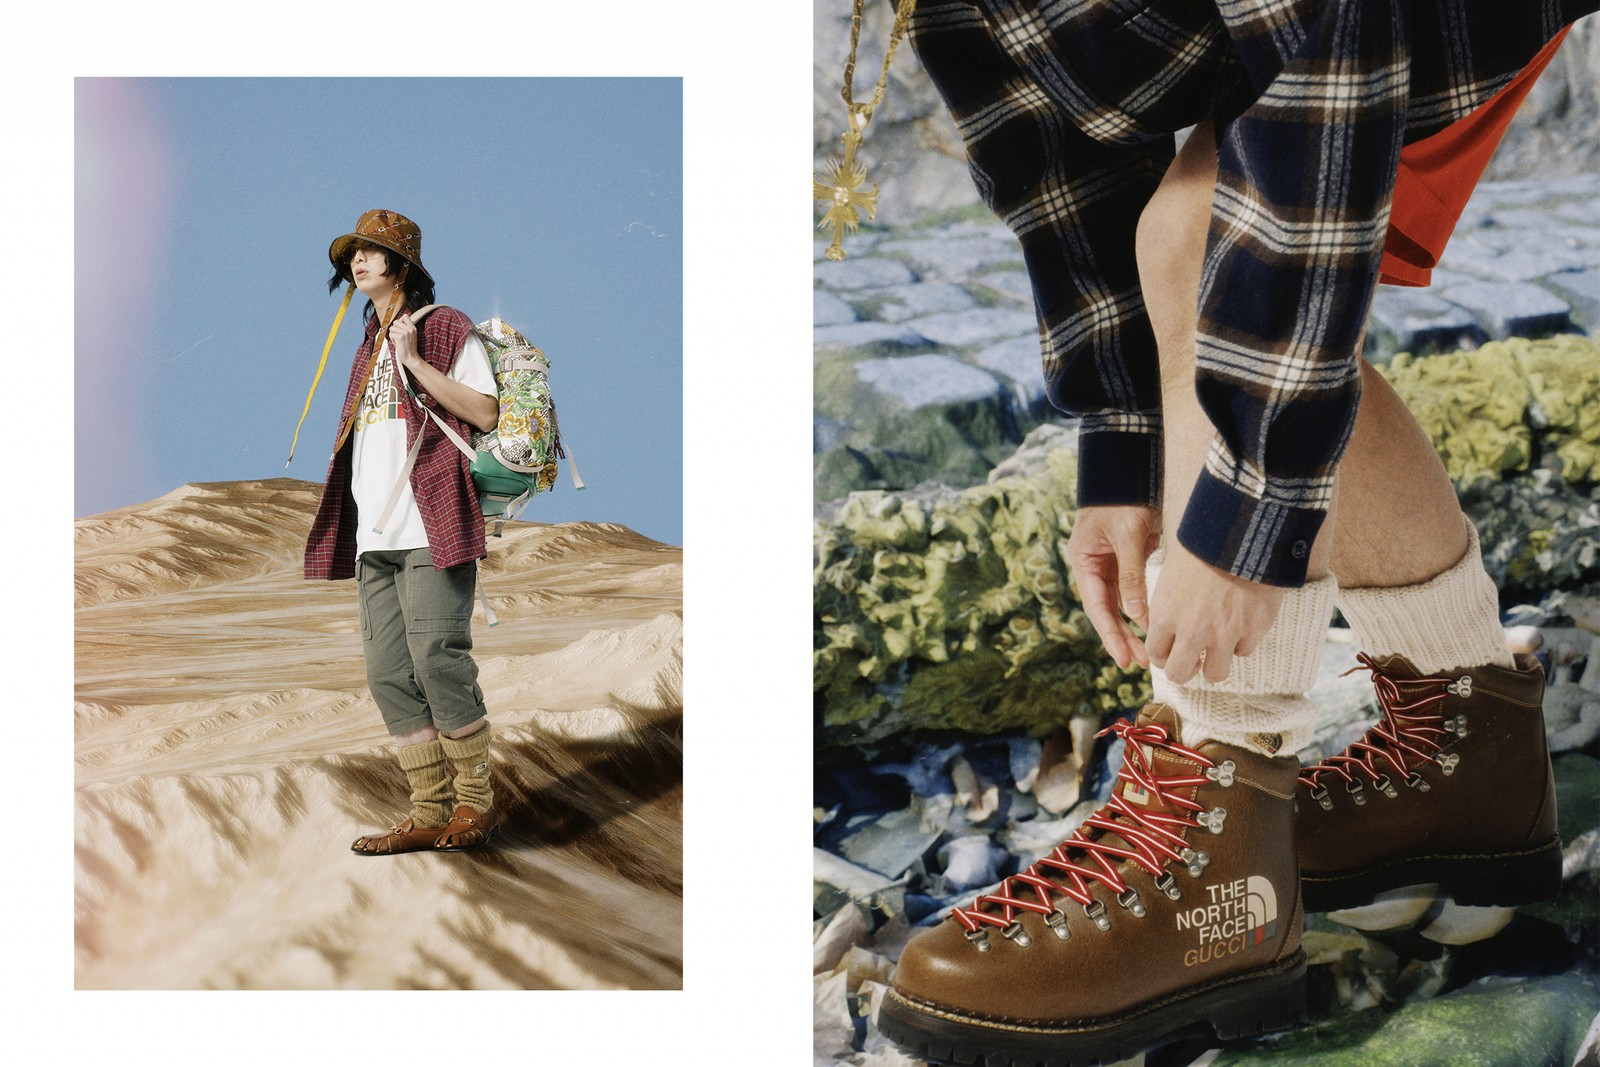 穿上 The North Face × Gucci 系列,展開虛擬歷險旅遊